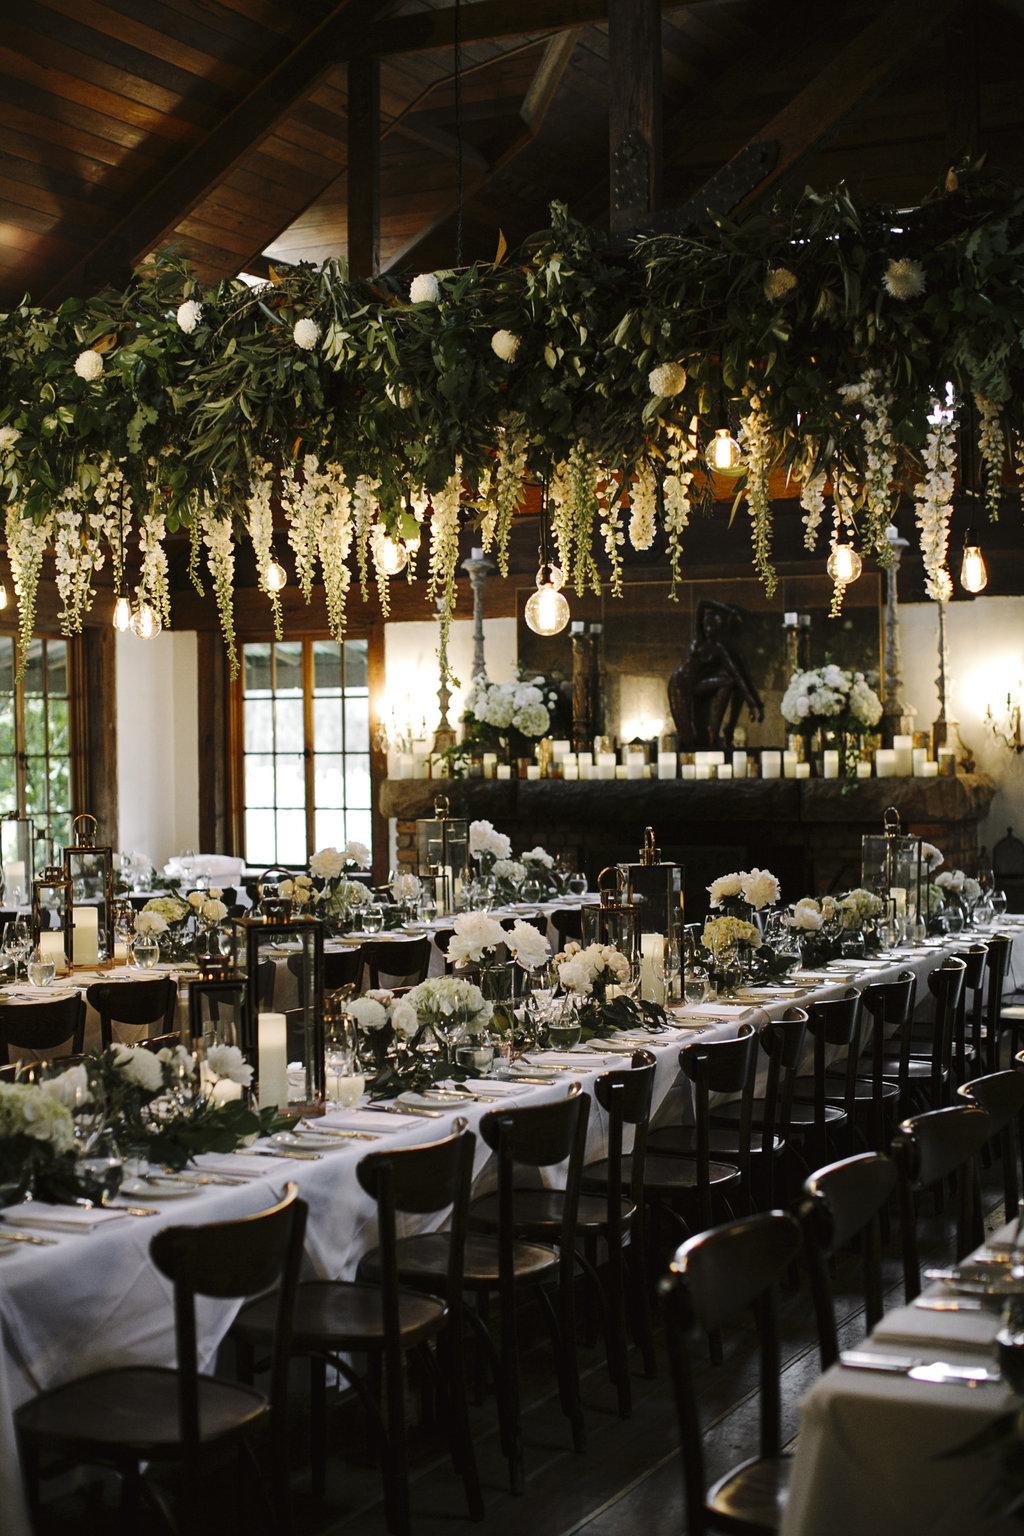 171118_justinaaron_wedding_danielle_michael_h-145.jpg